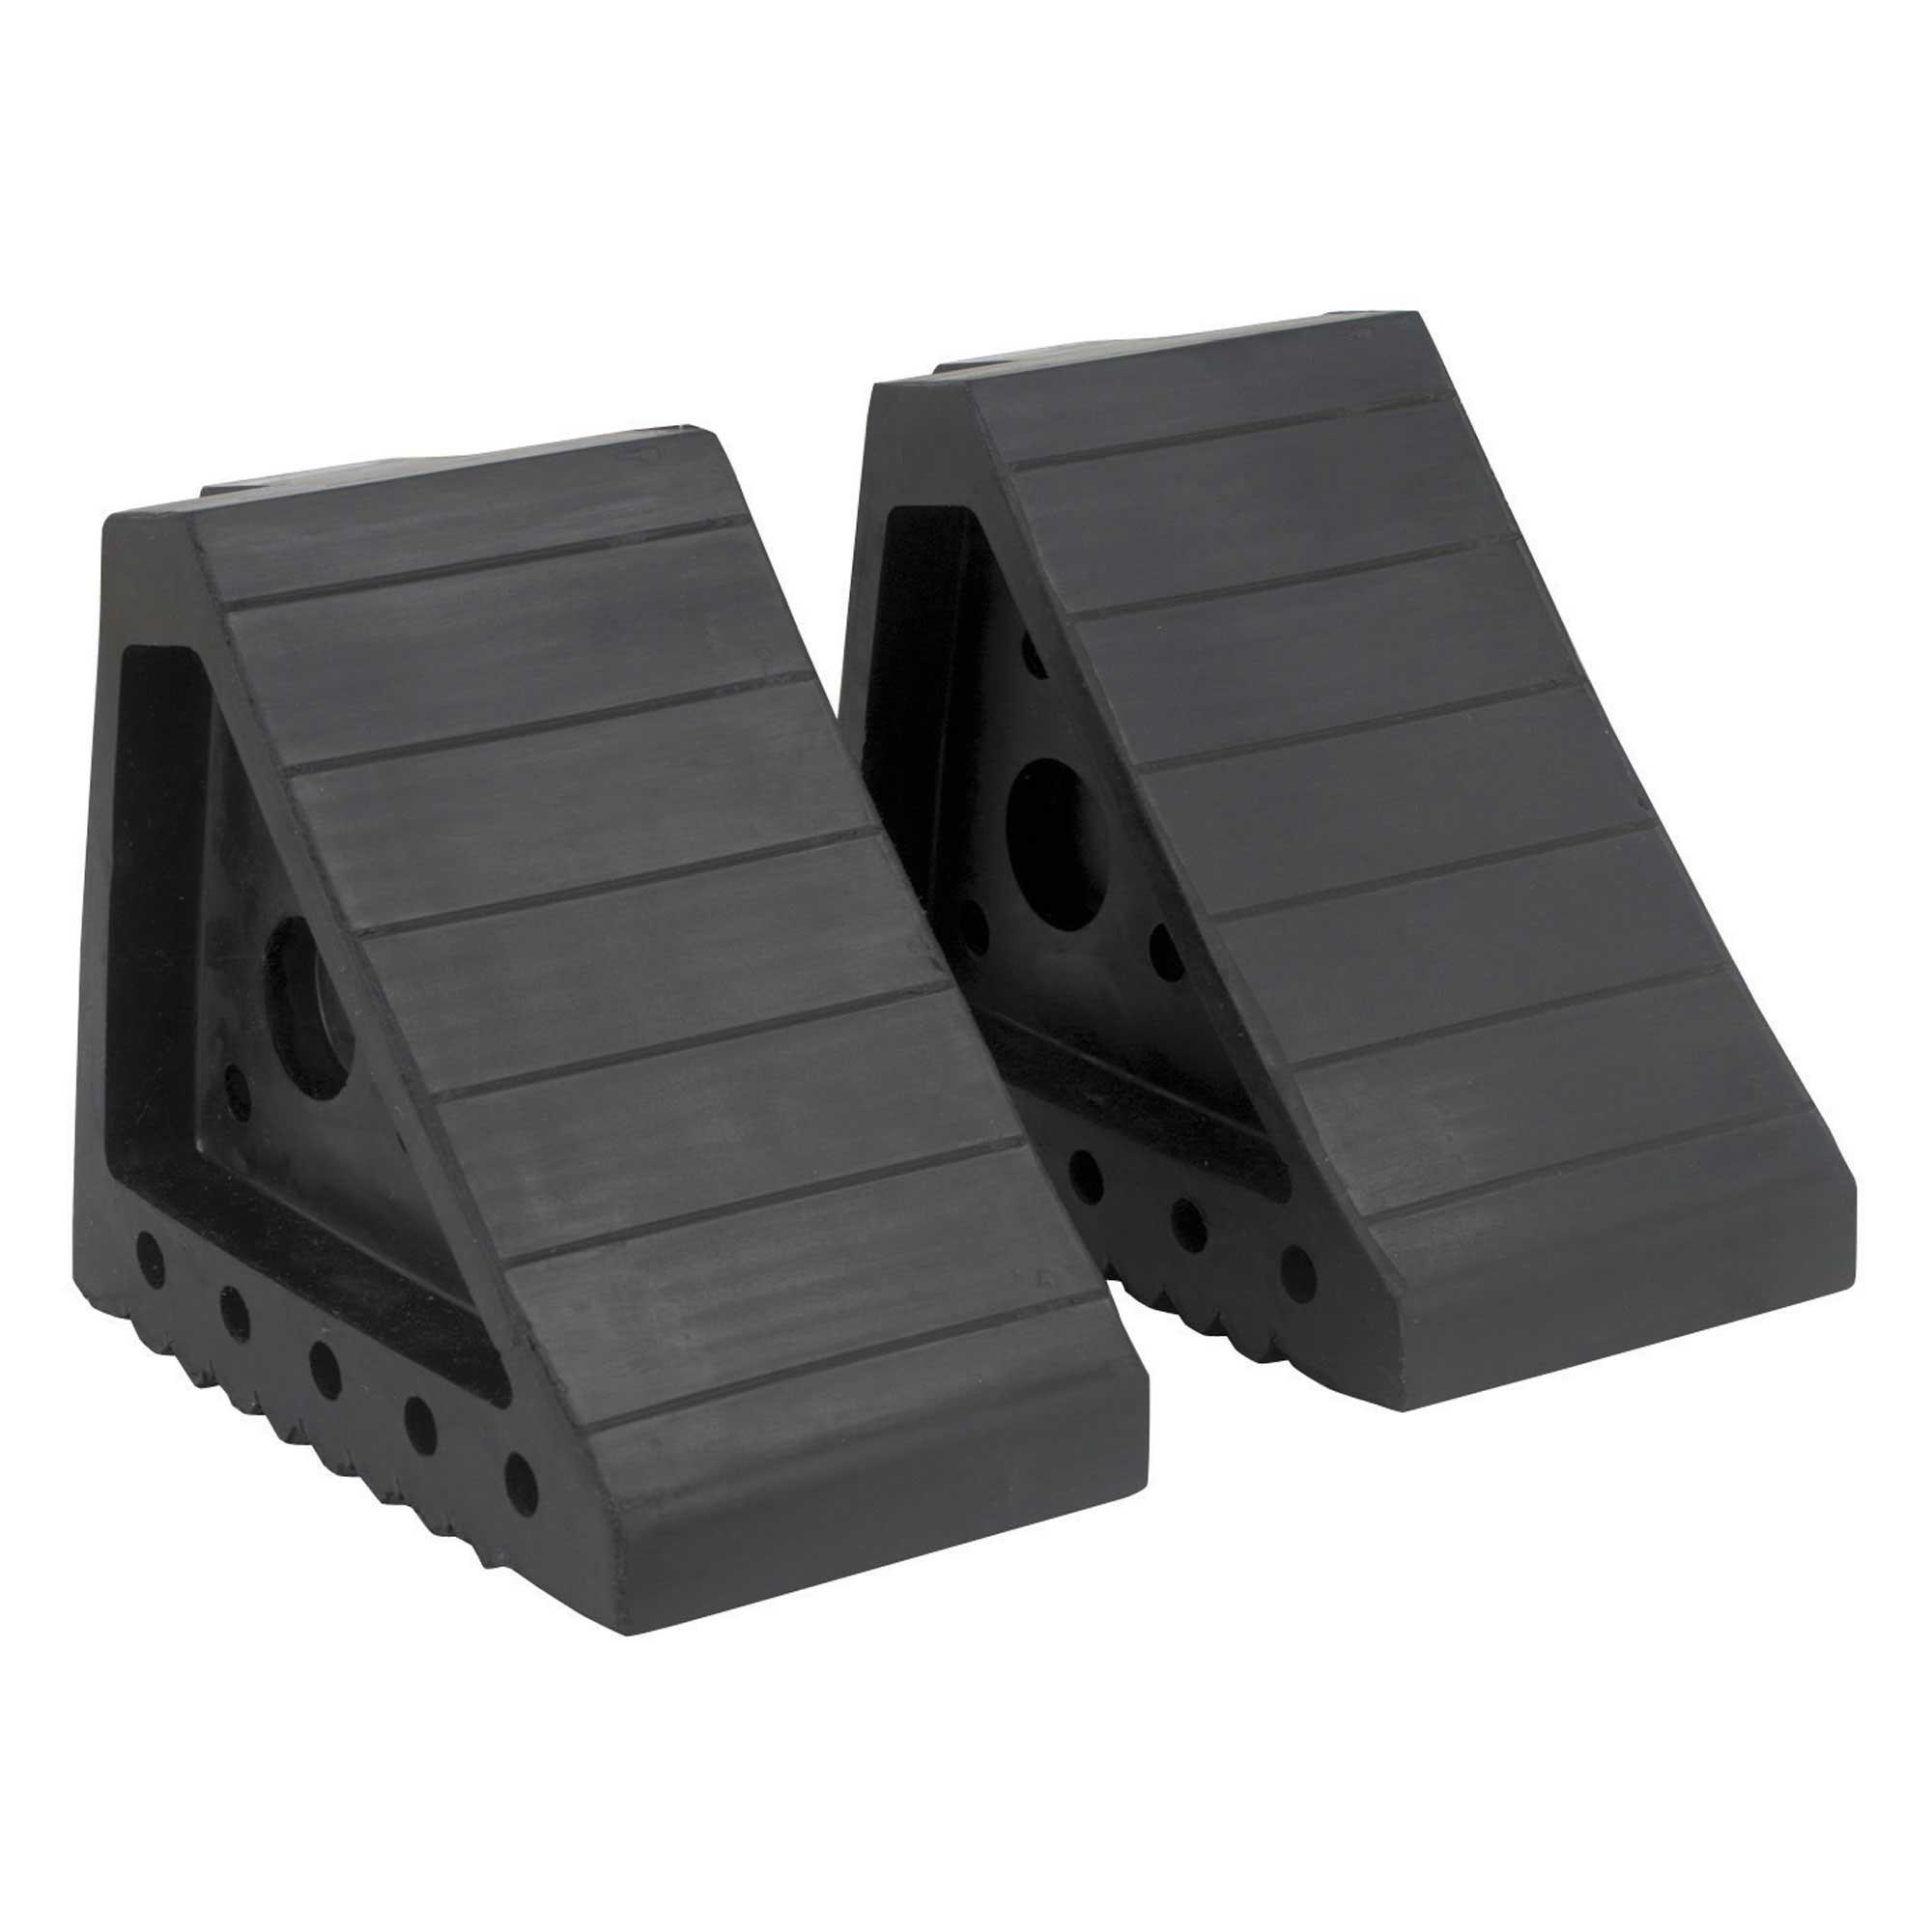 Sealey Pair Of Rubber Wheel Chocks - 4 Ton Capacity WC01